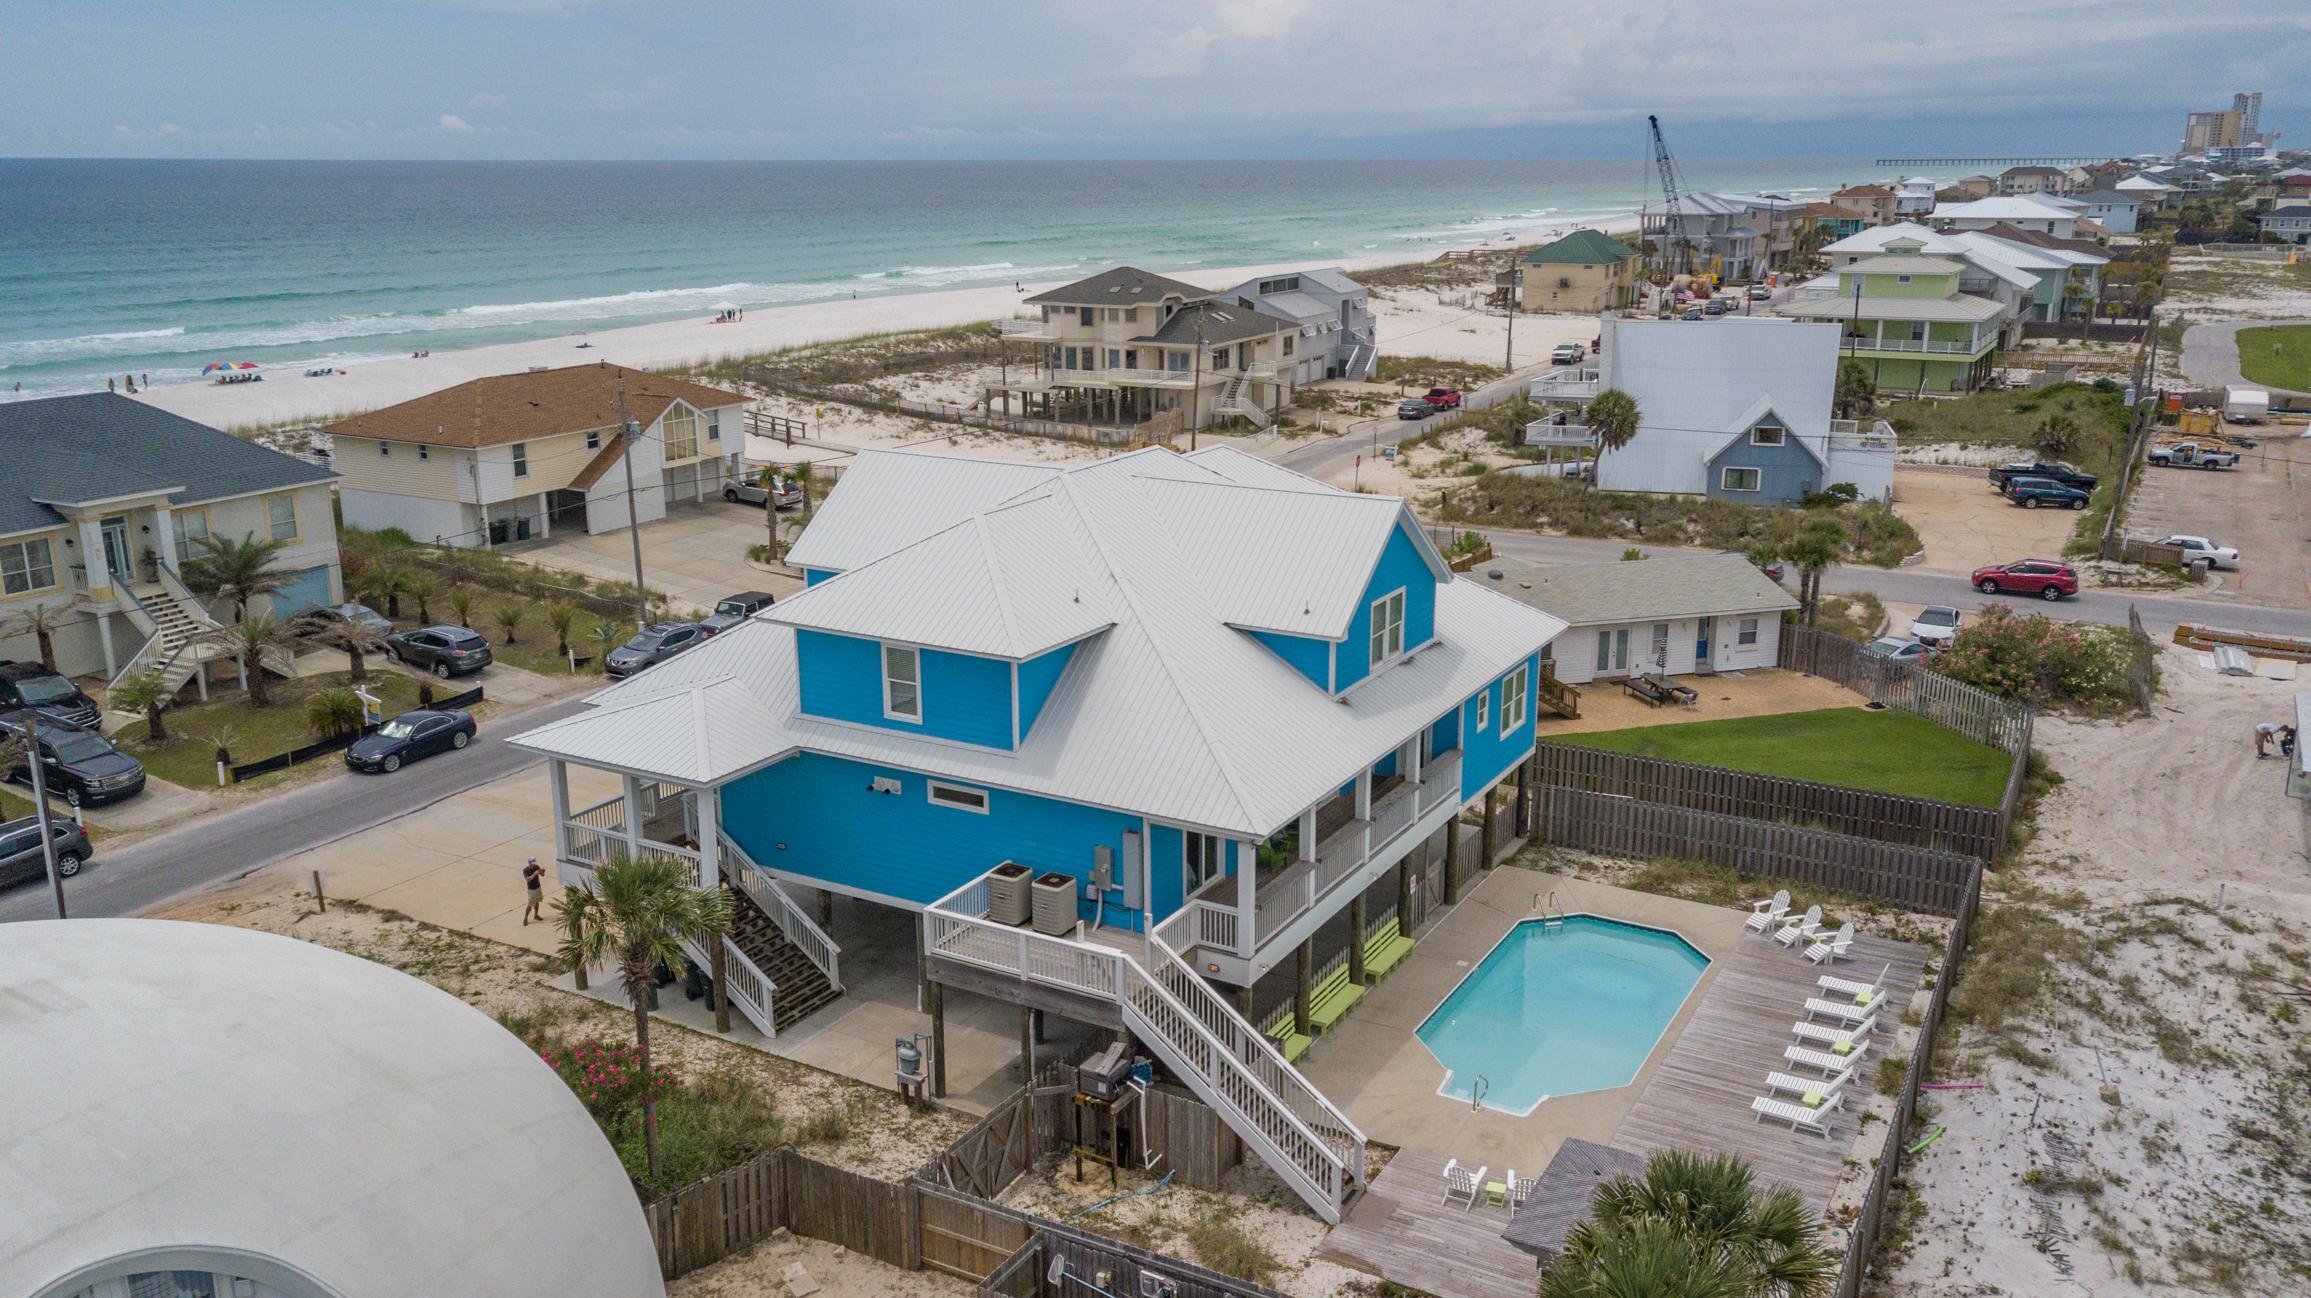 Ariola 1003 - The Starfish House House/Cottage rental in Pensacola Beach House Rentals in Pensacola Beach Florida - #67